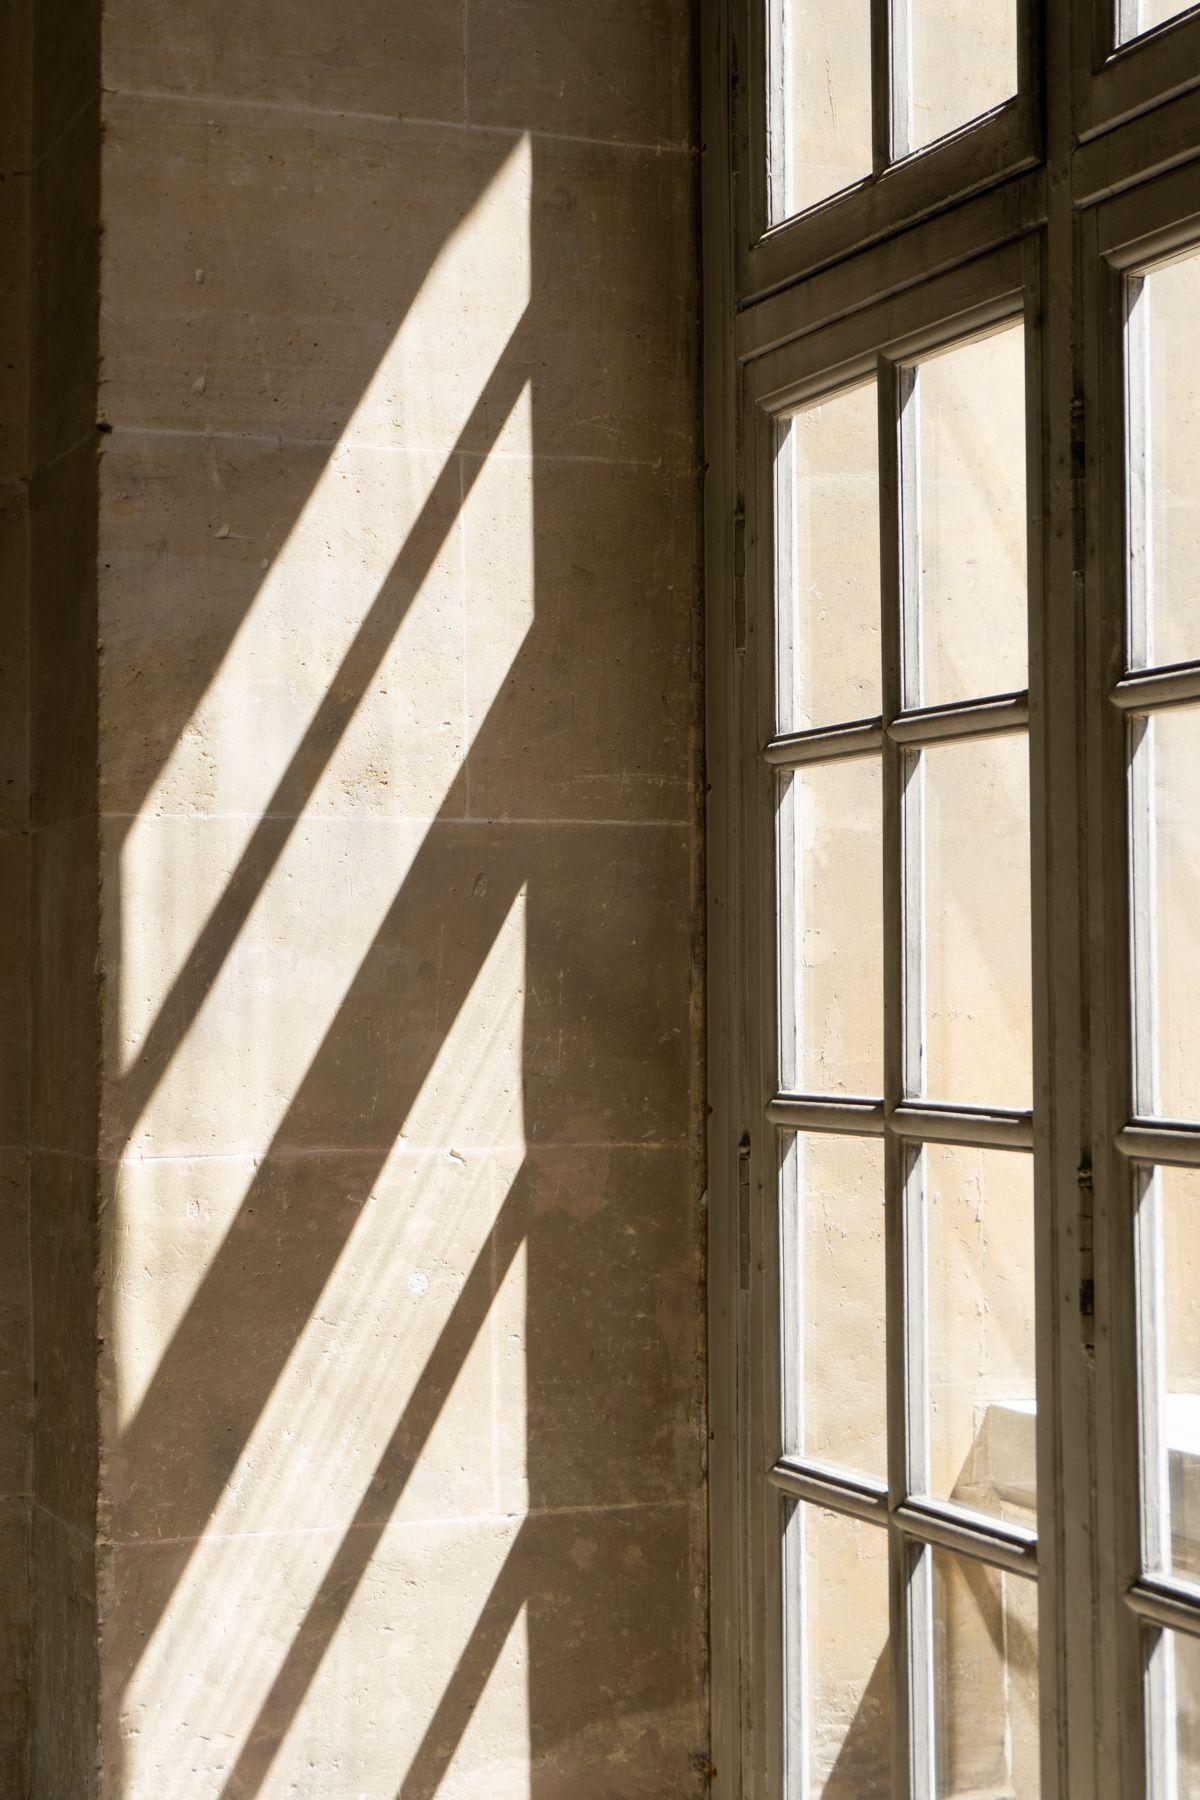 Shadows and Light ~ Summer in Beige, European Travel Snapshot | RG Daily Blog